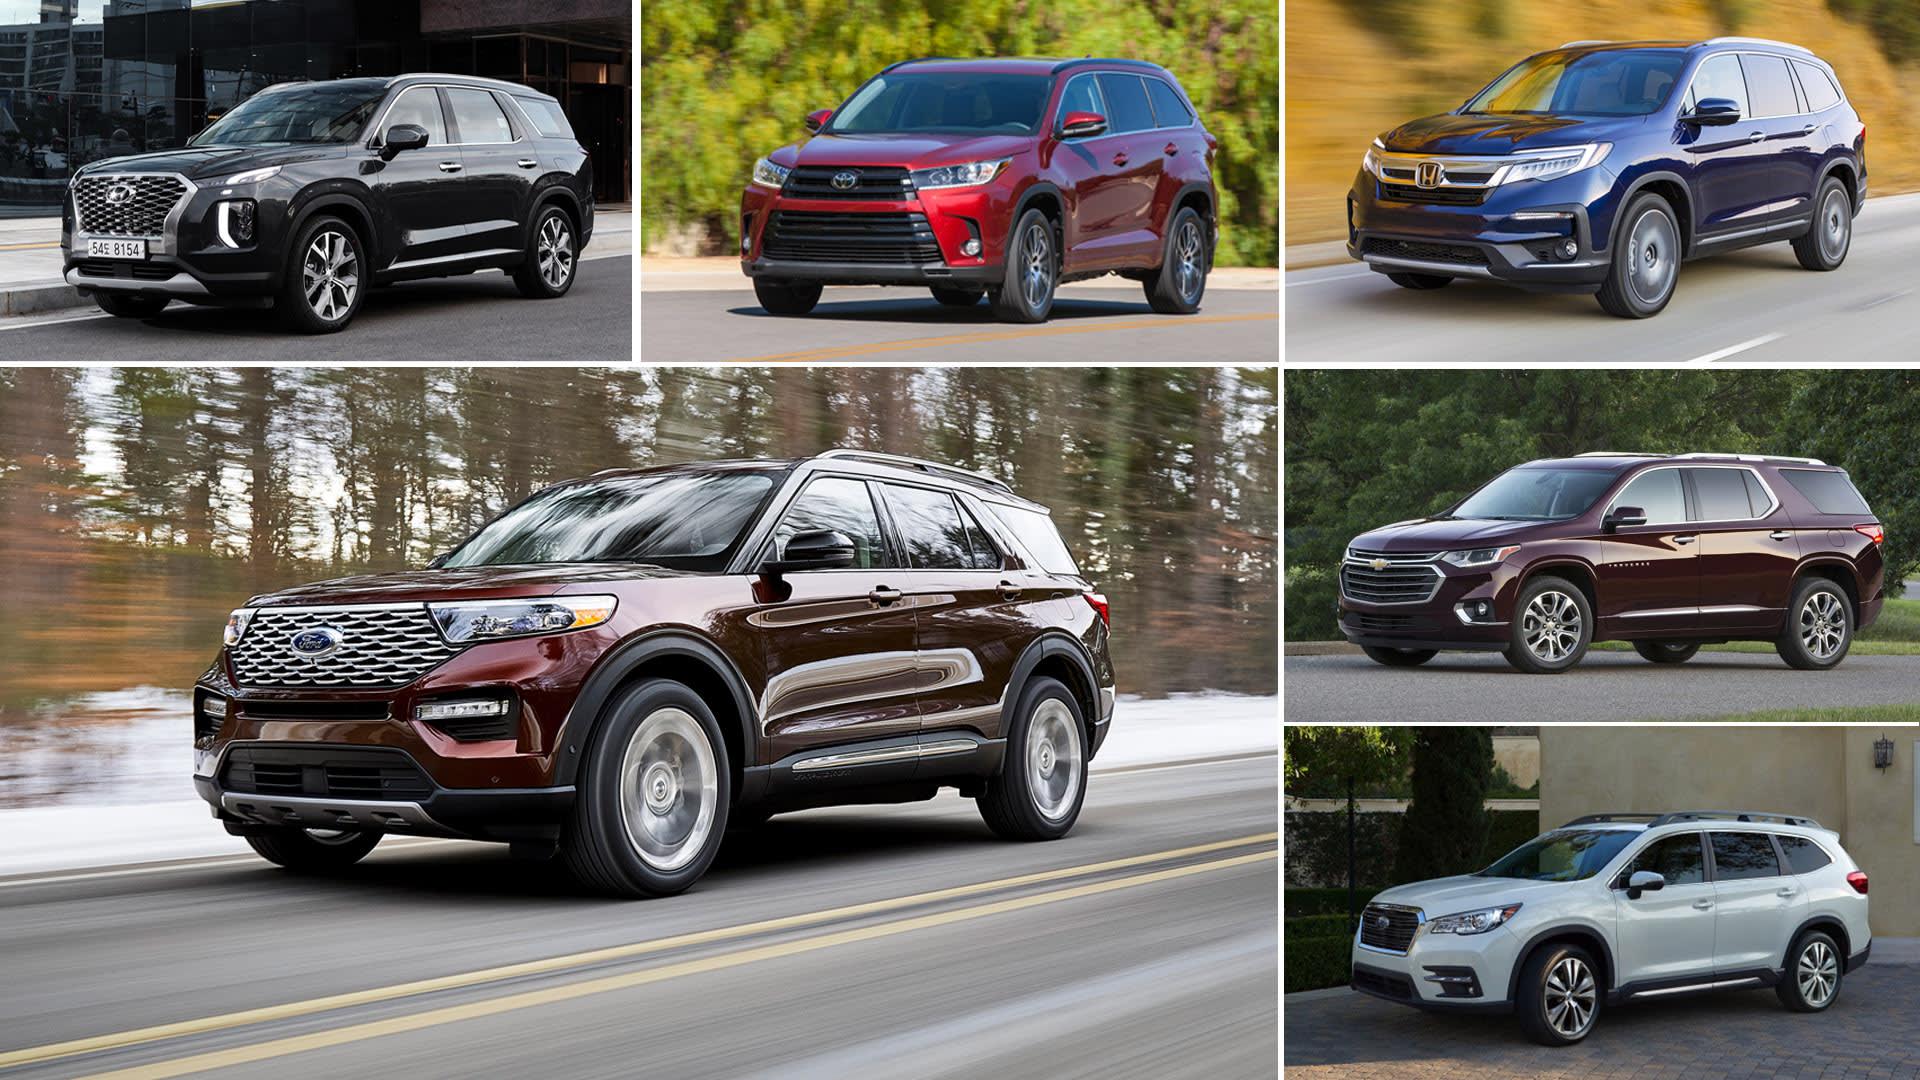 2020 Ford Explorer Comparison